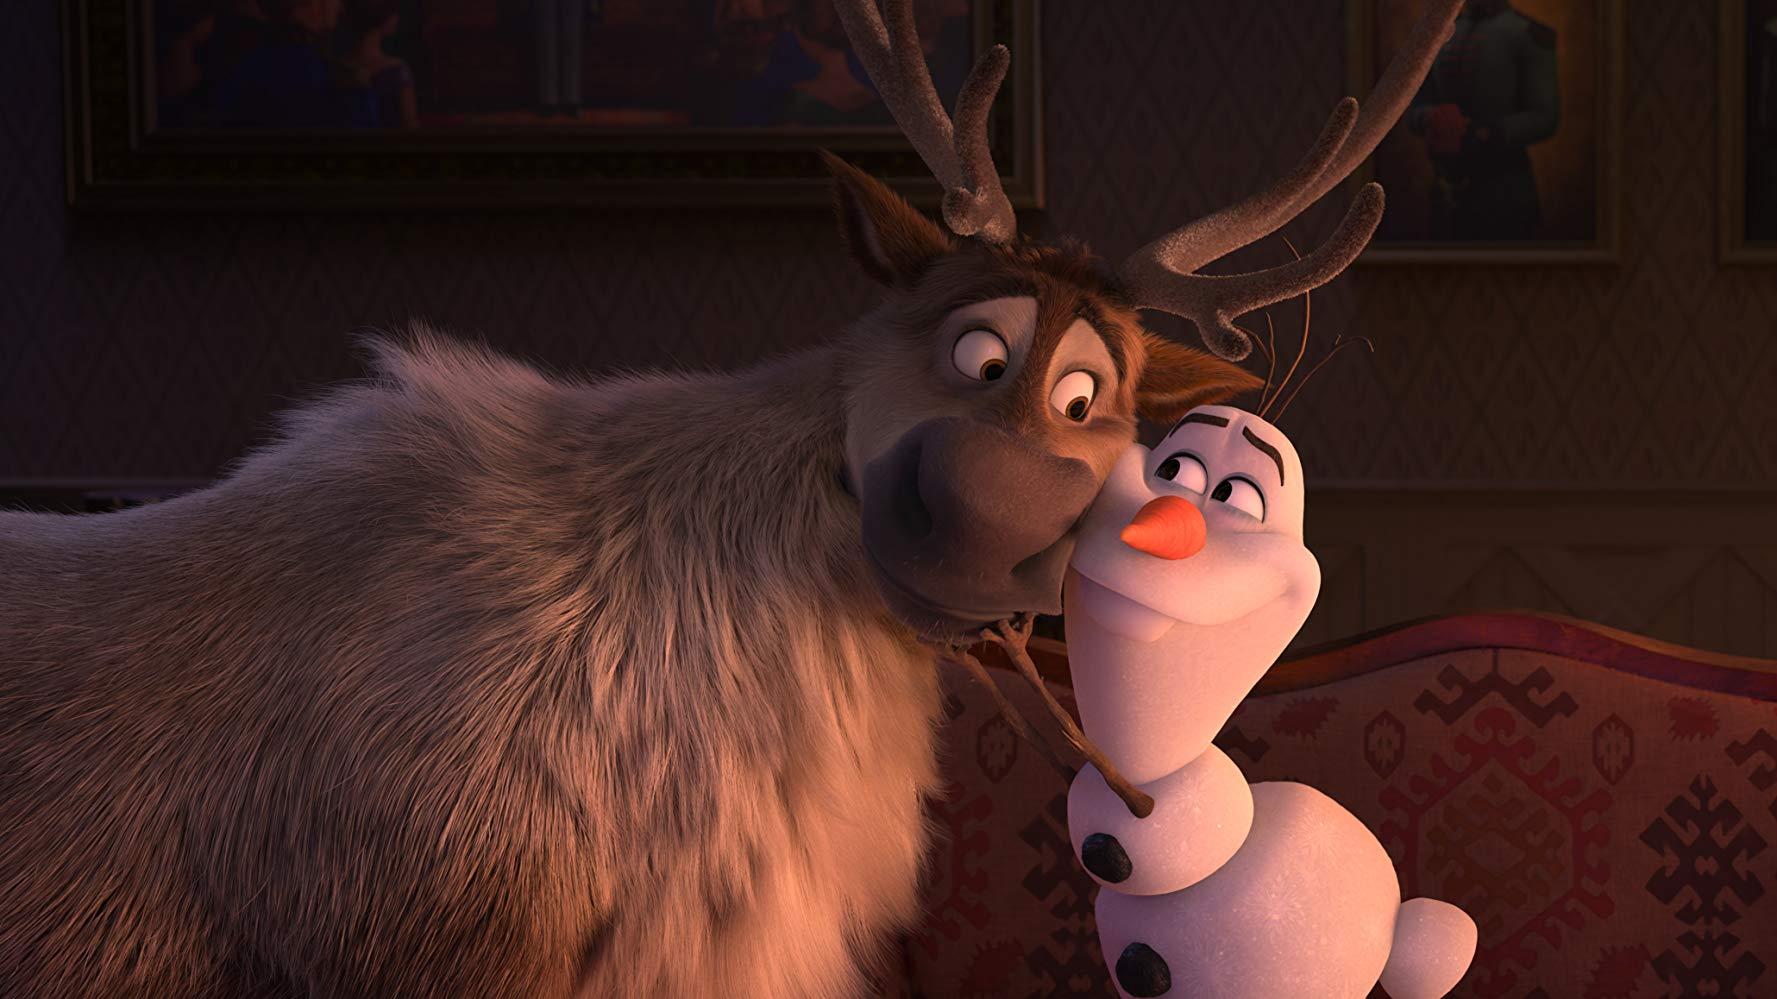 'Frozen 2' becomes Disney's sixth billion-dollar movie this year